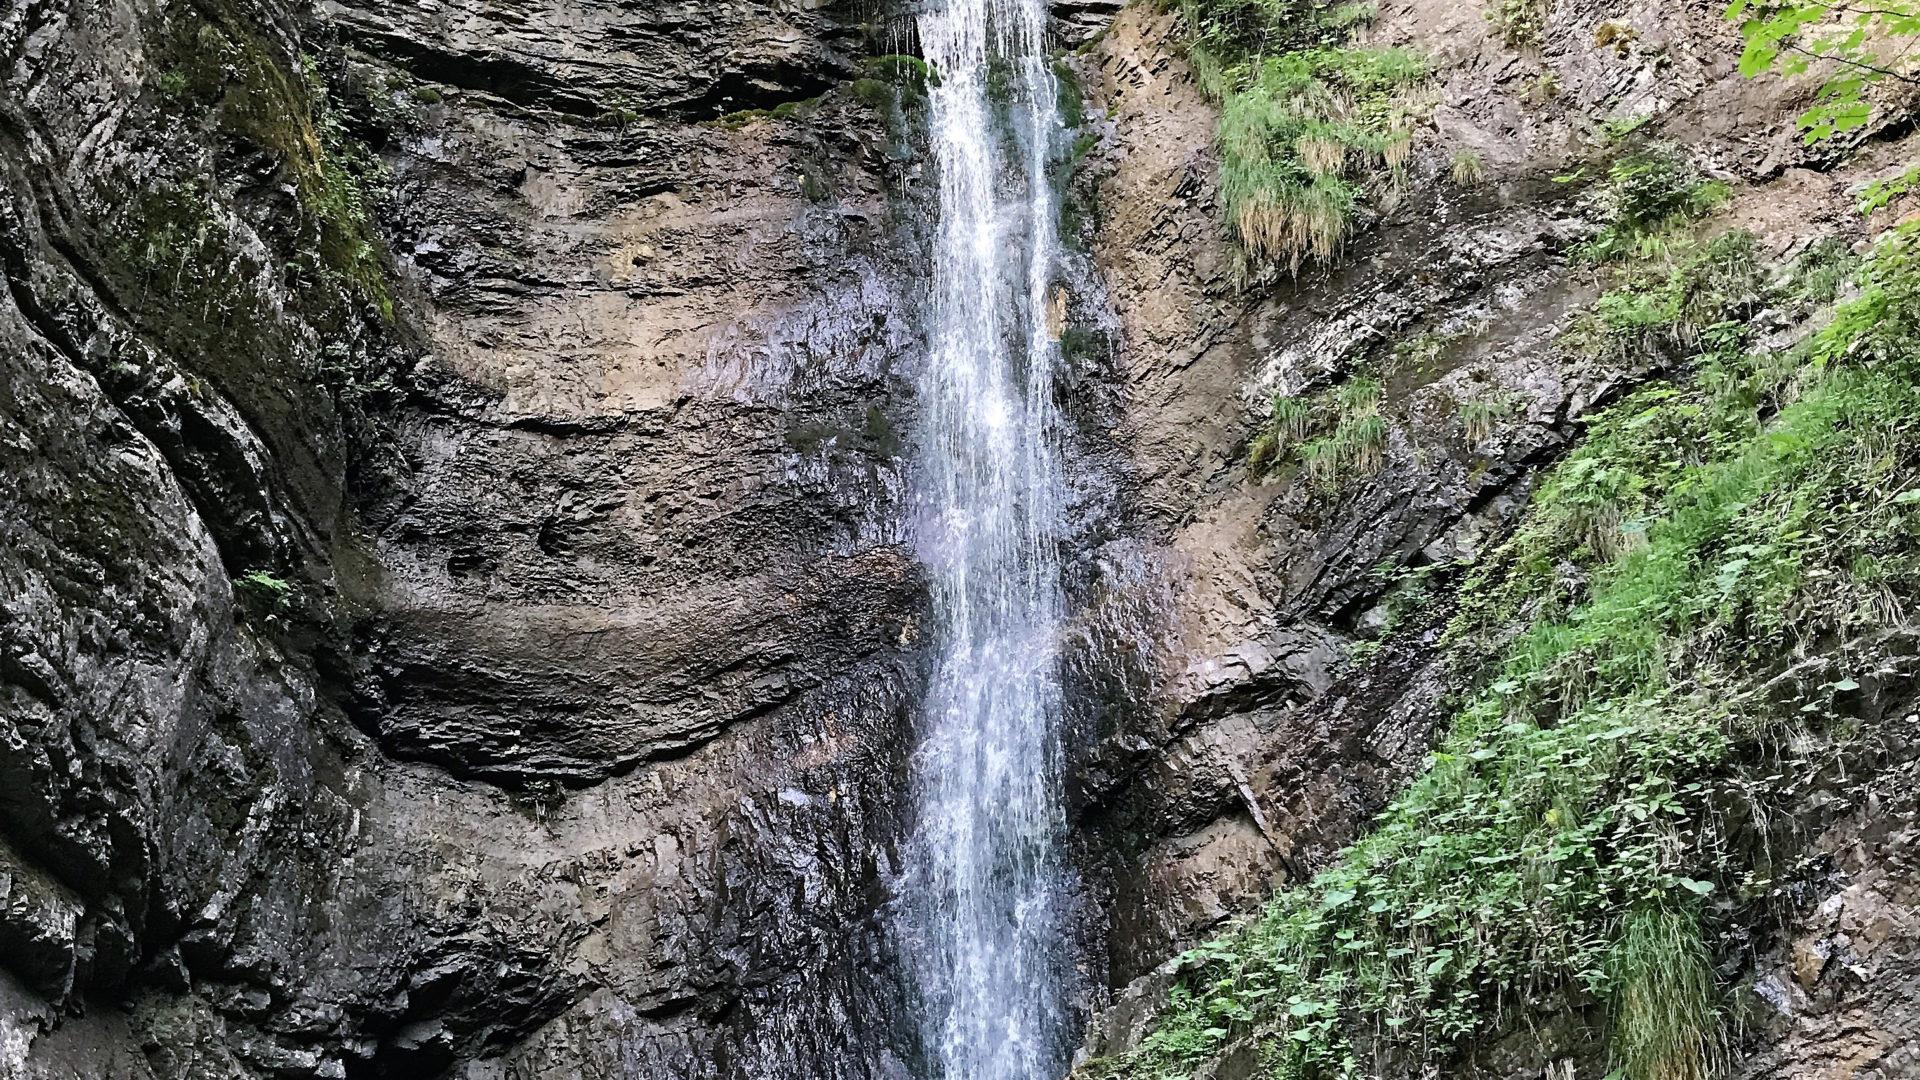 Wasserfall Ausserberg in Bürserberg